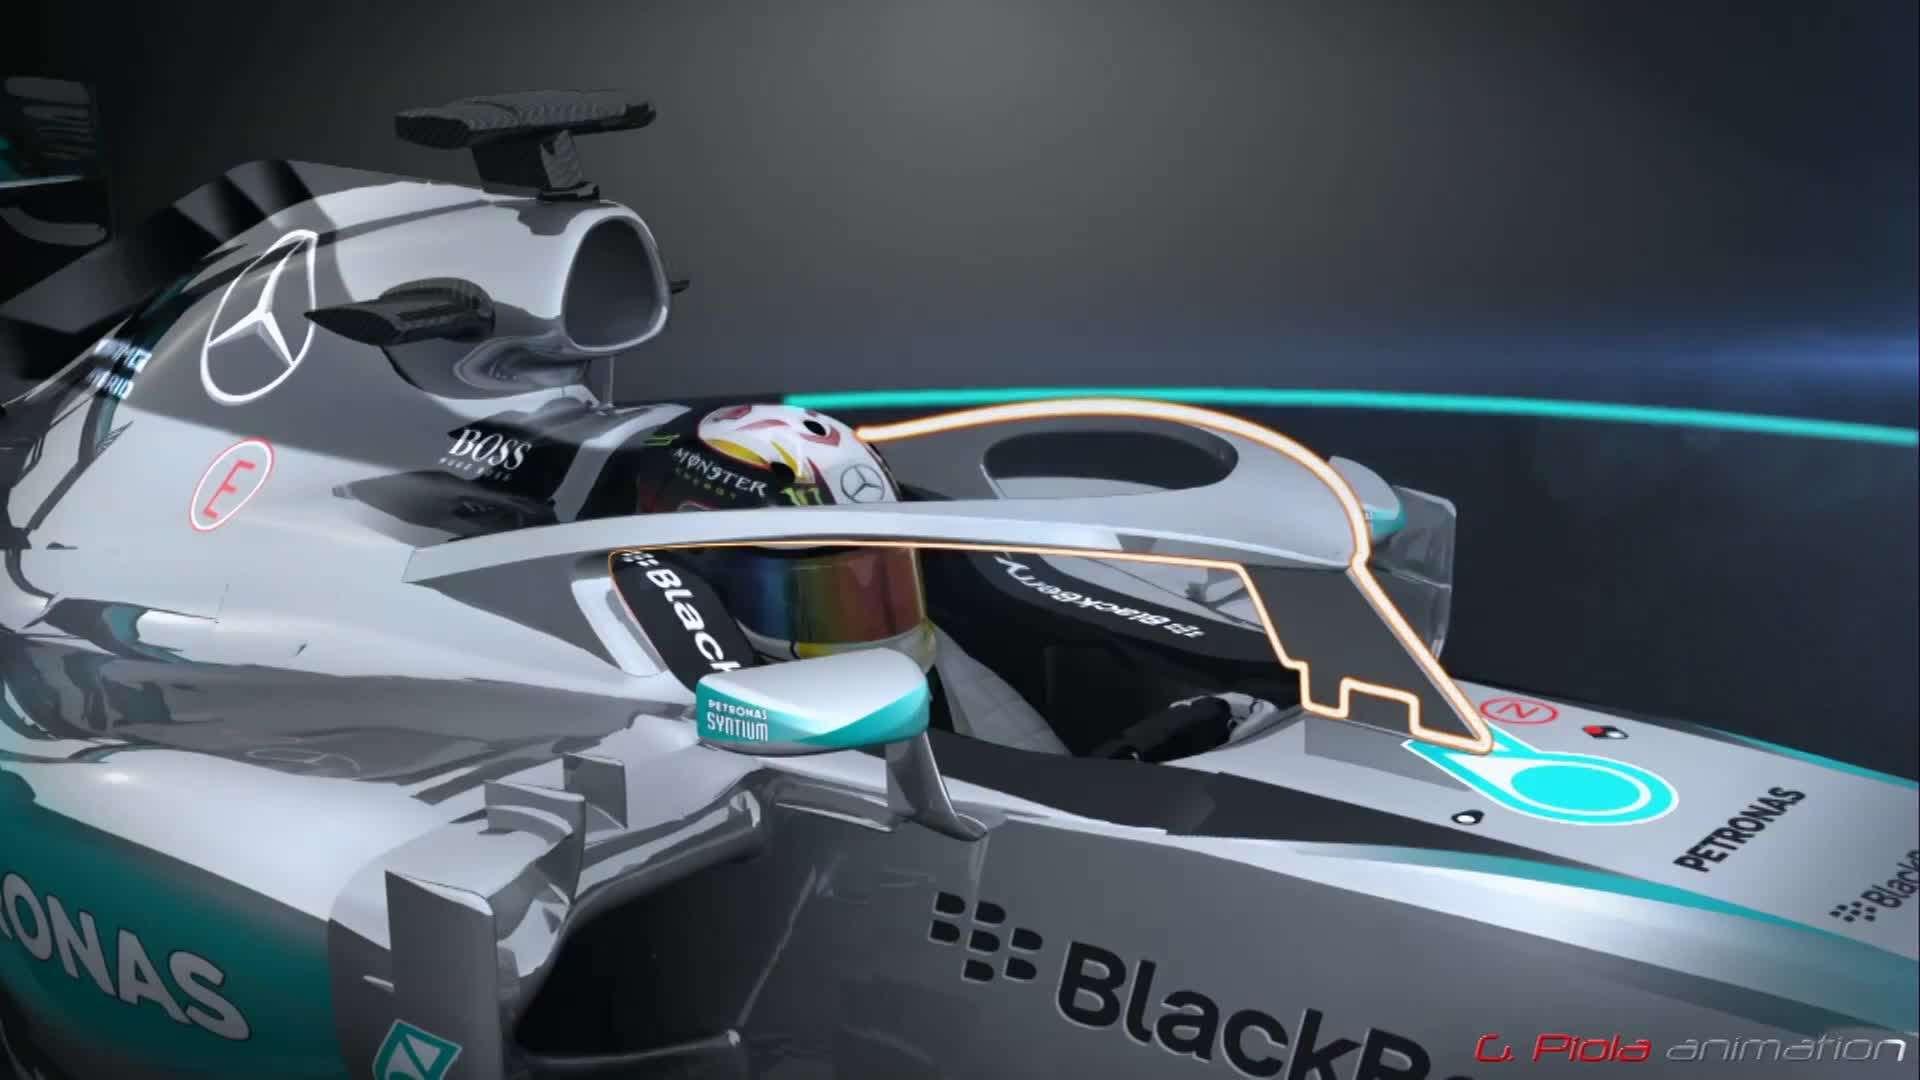 F1 Mercedes Halo Closed Cockpit